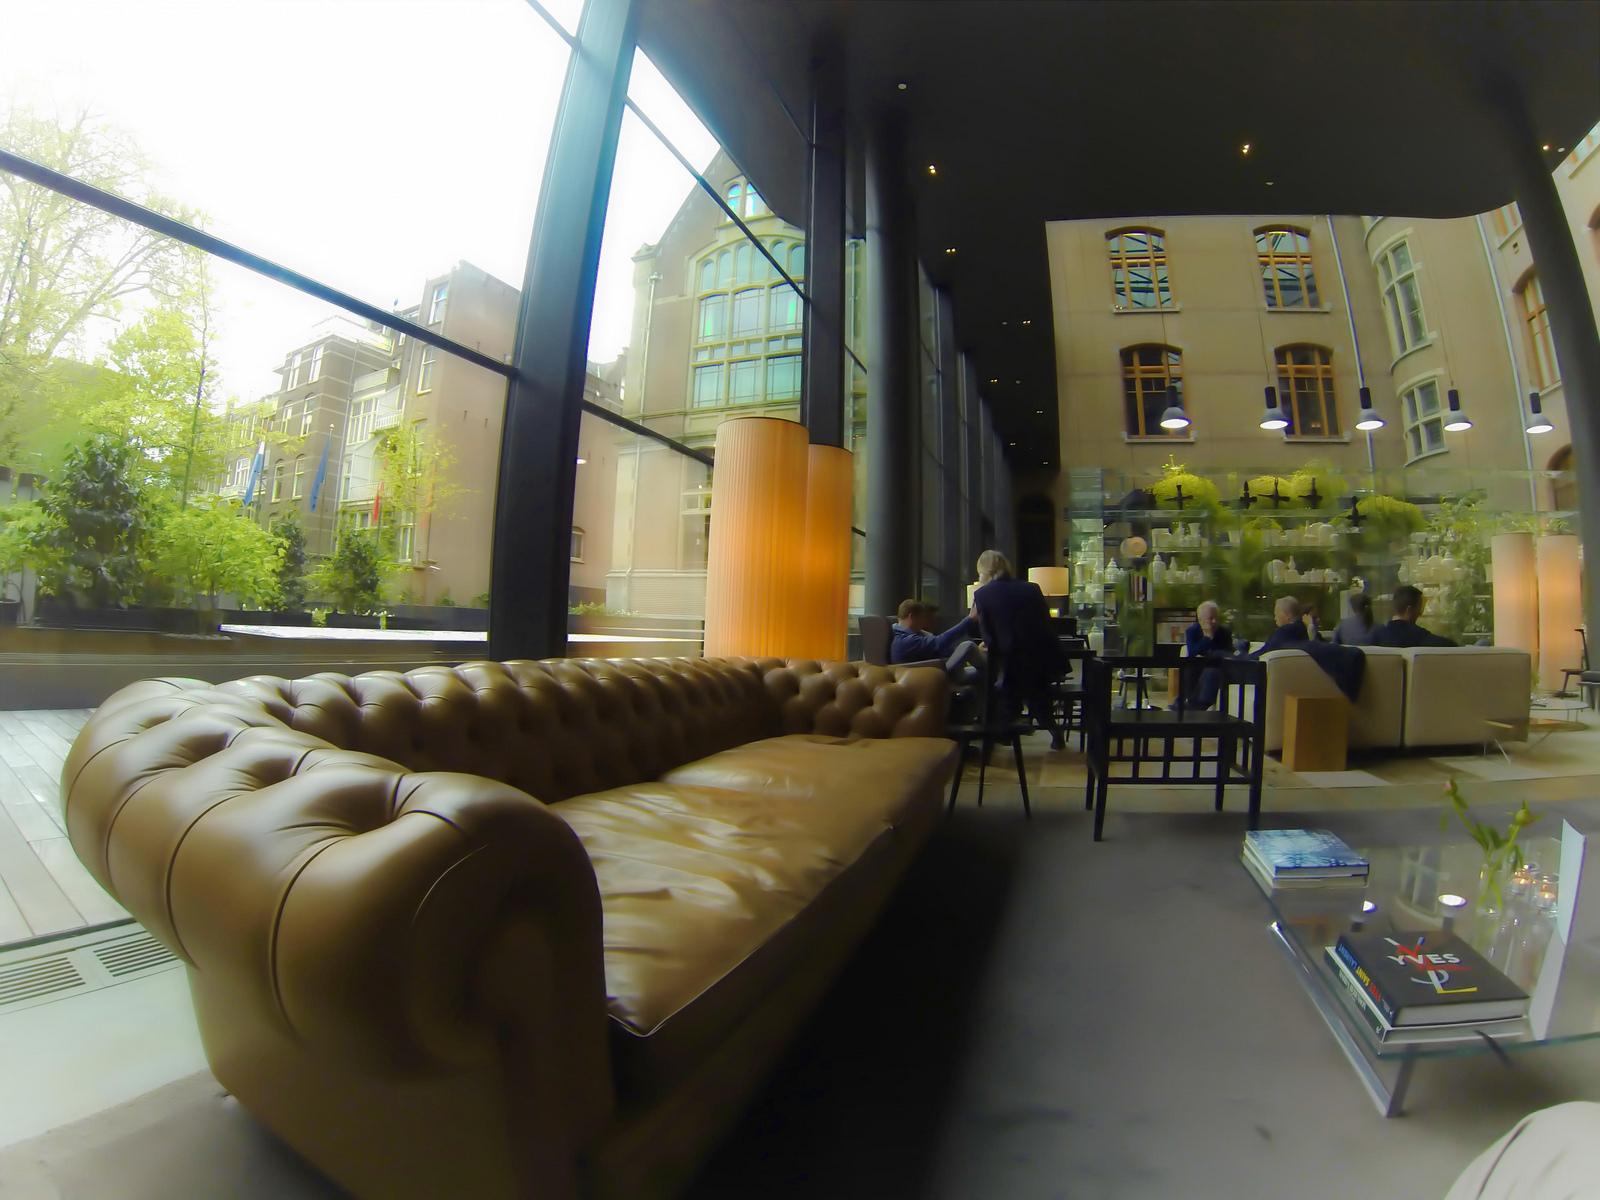 chesterfield-sofa-low-coffee-tables-lobby-conservatorium-hotel-amsterdam.jpg